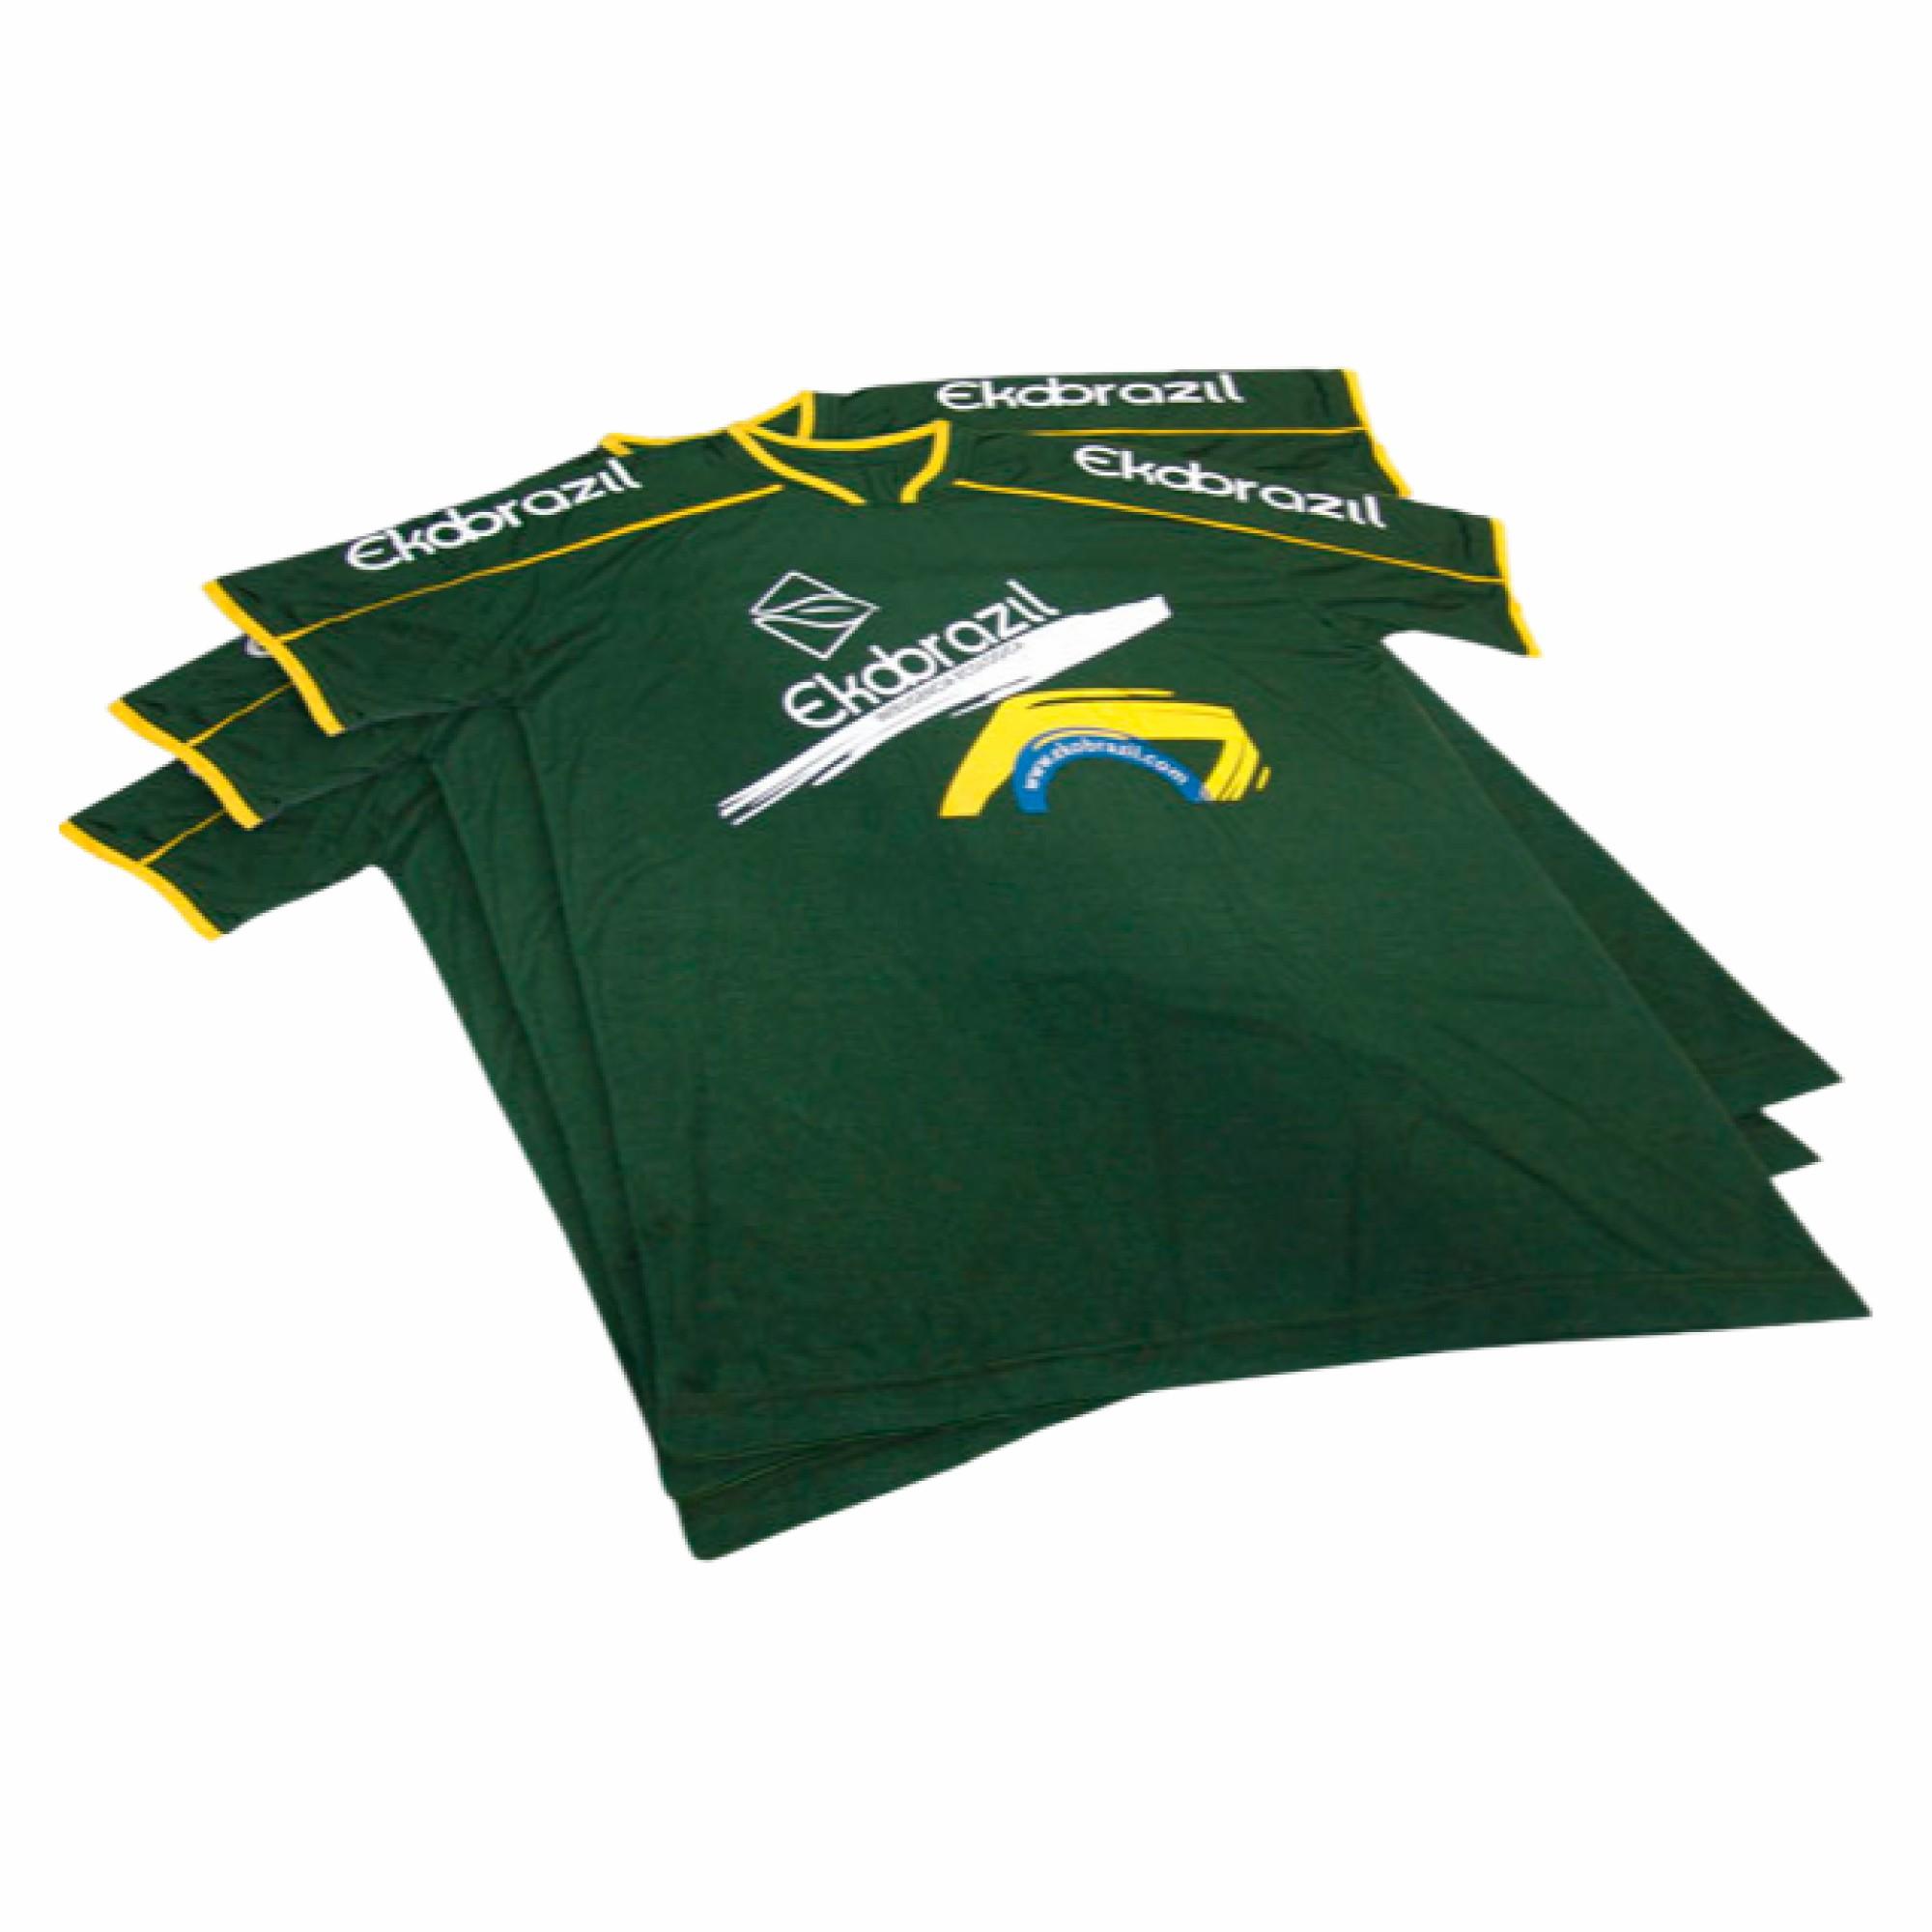 Preço Camiseta Ekobrazil GG